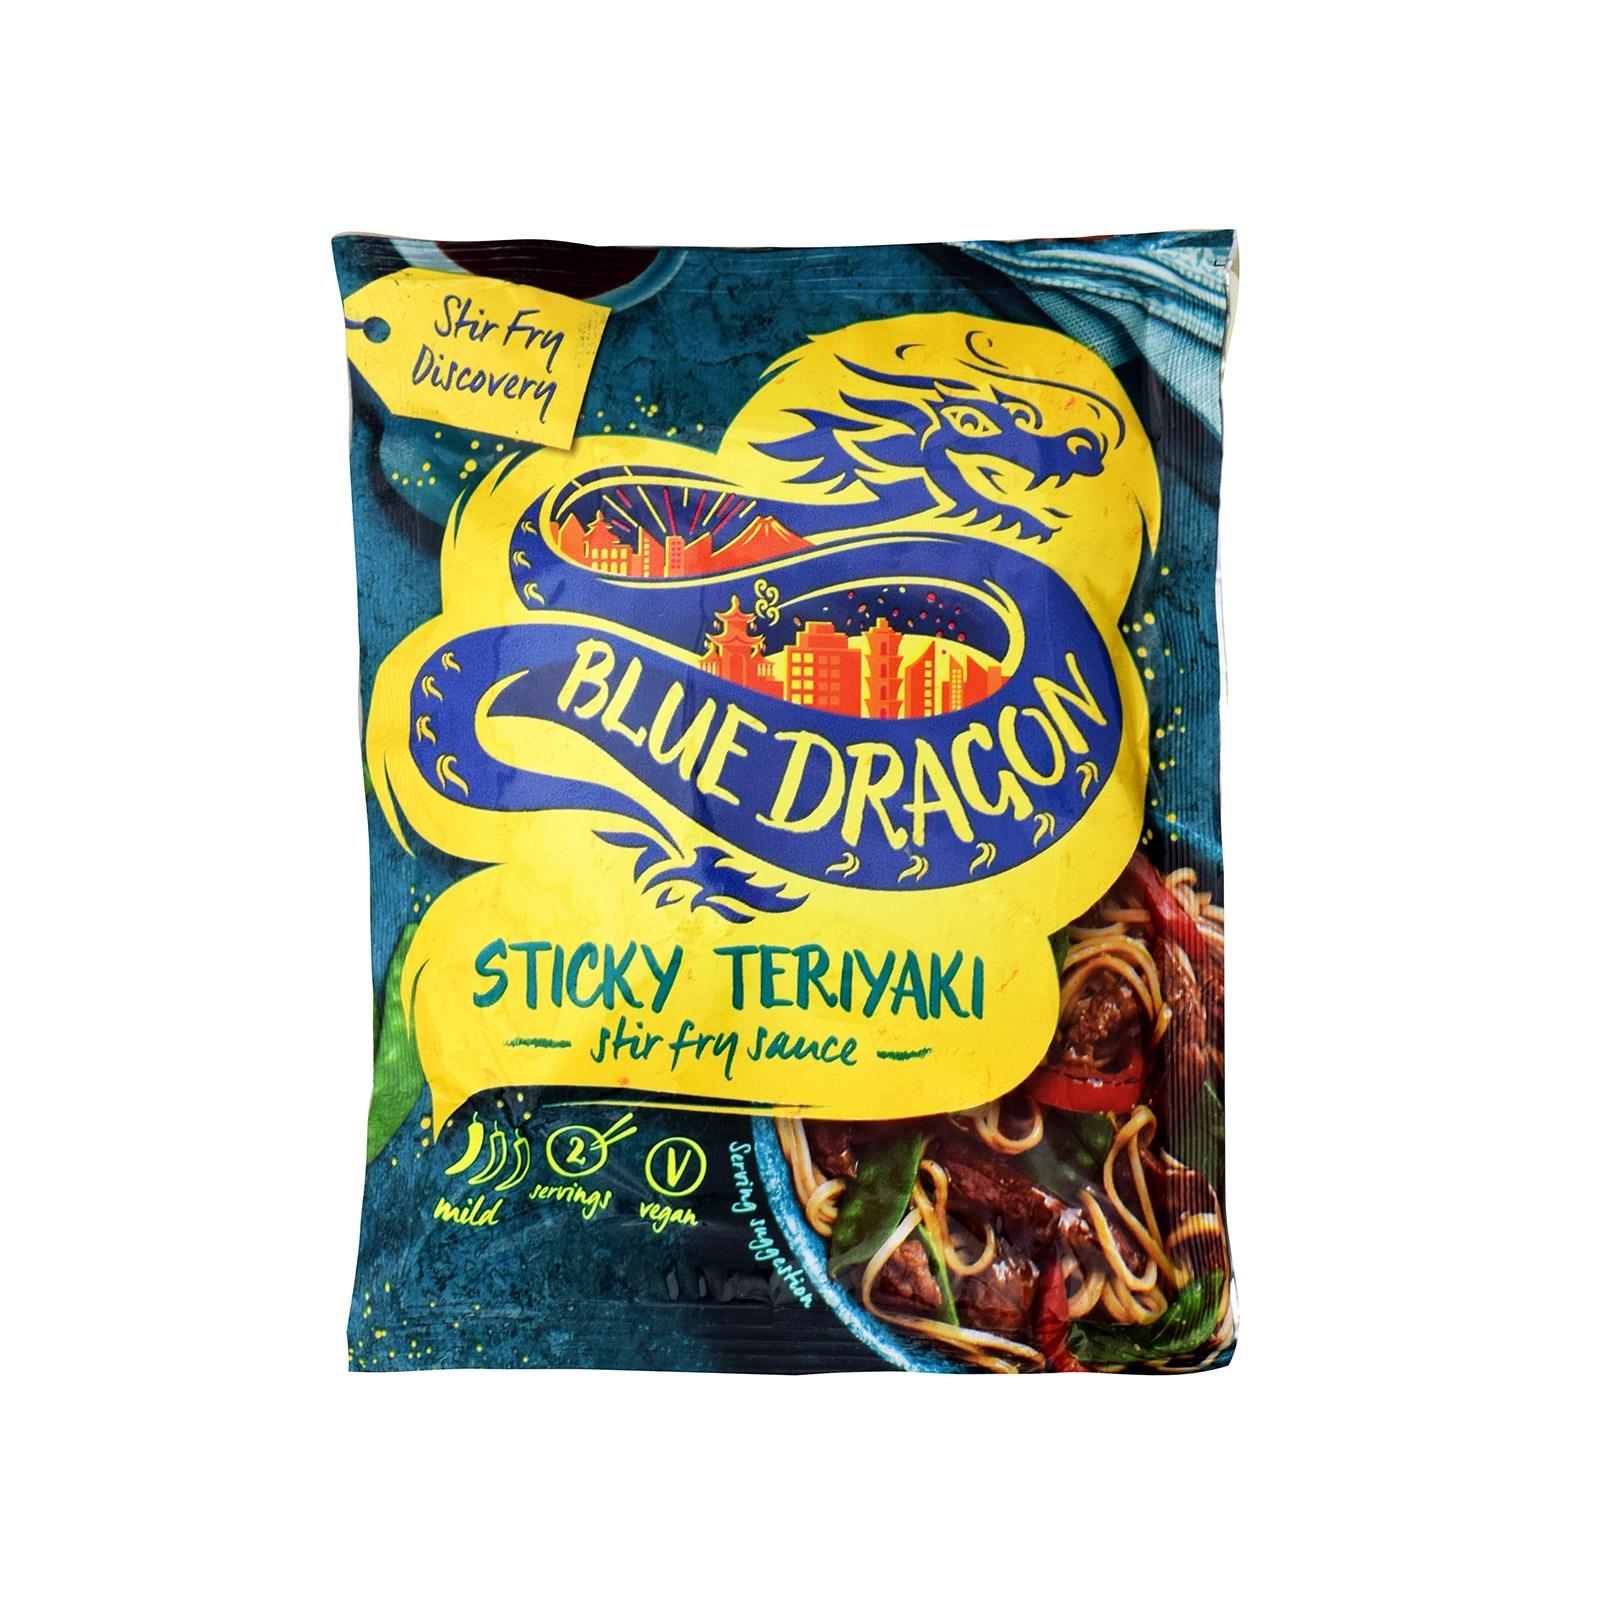 Blue Dragon  Sticky Teriyaki Stir Fry Sauce